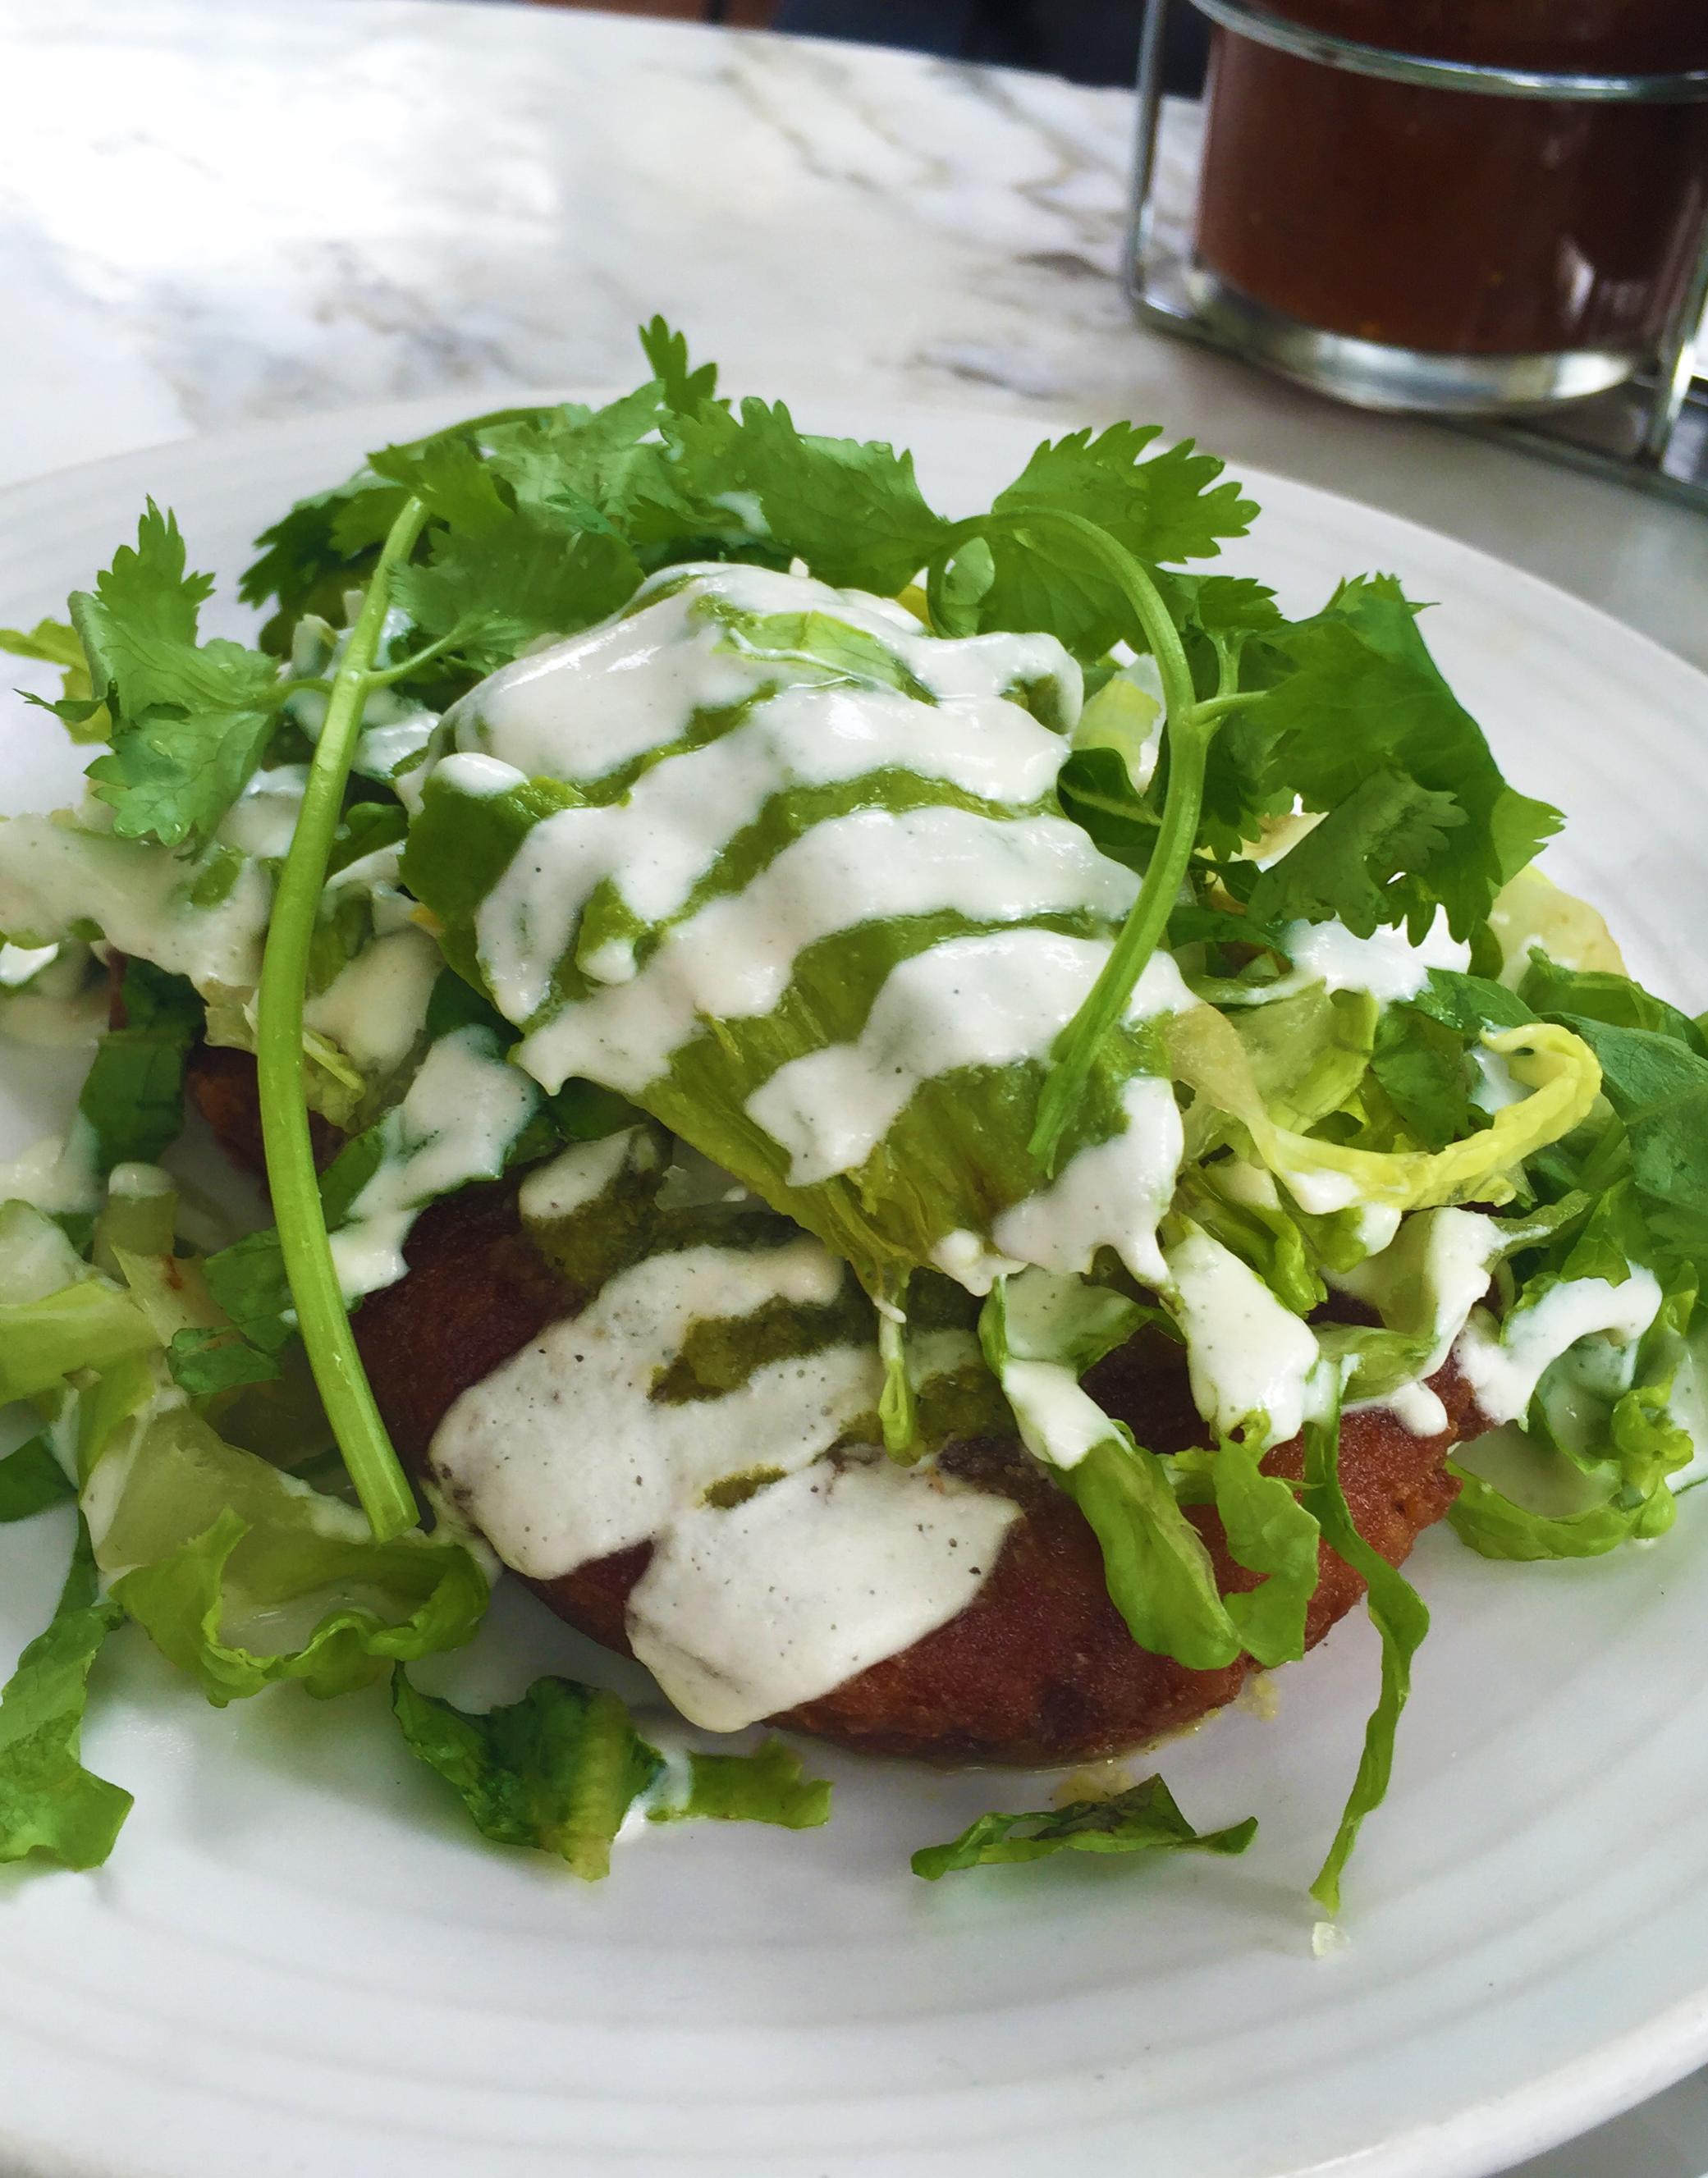 GORDITAS - potato-masa cakes - warm salsa verde - avocado - cashew crema